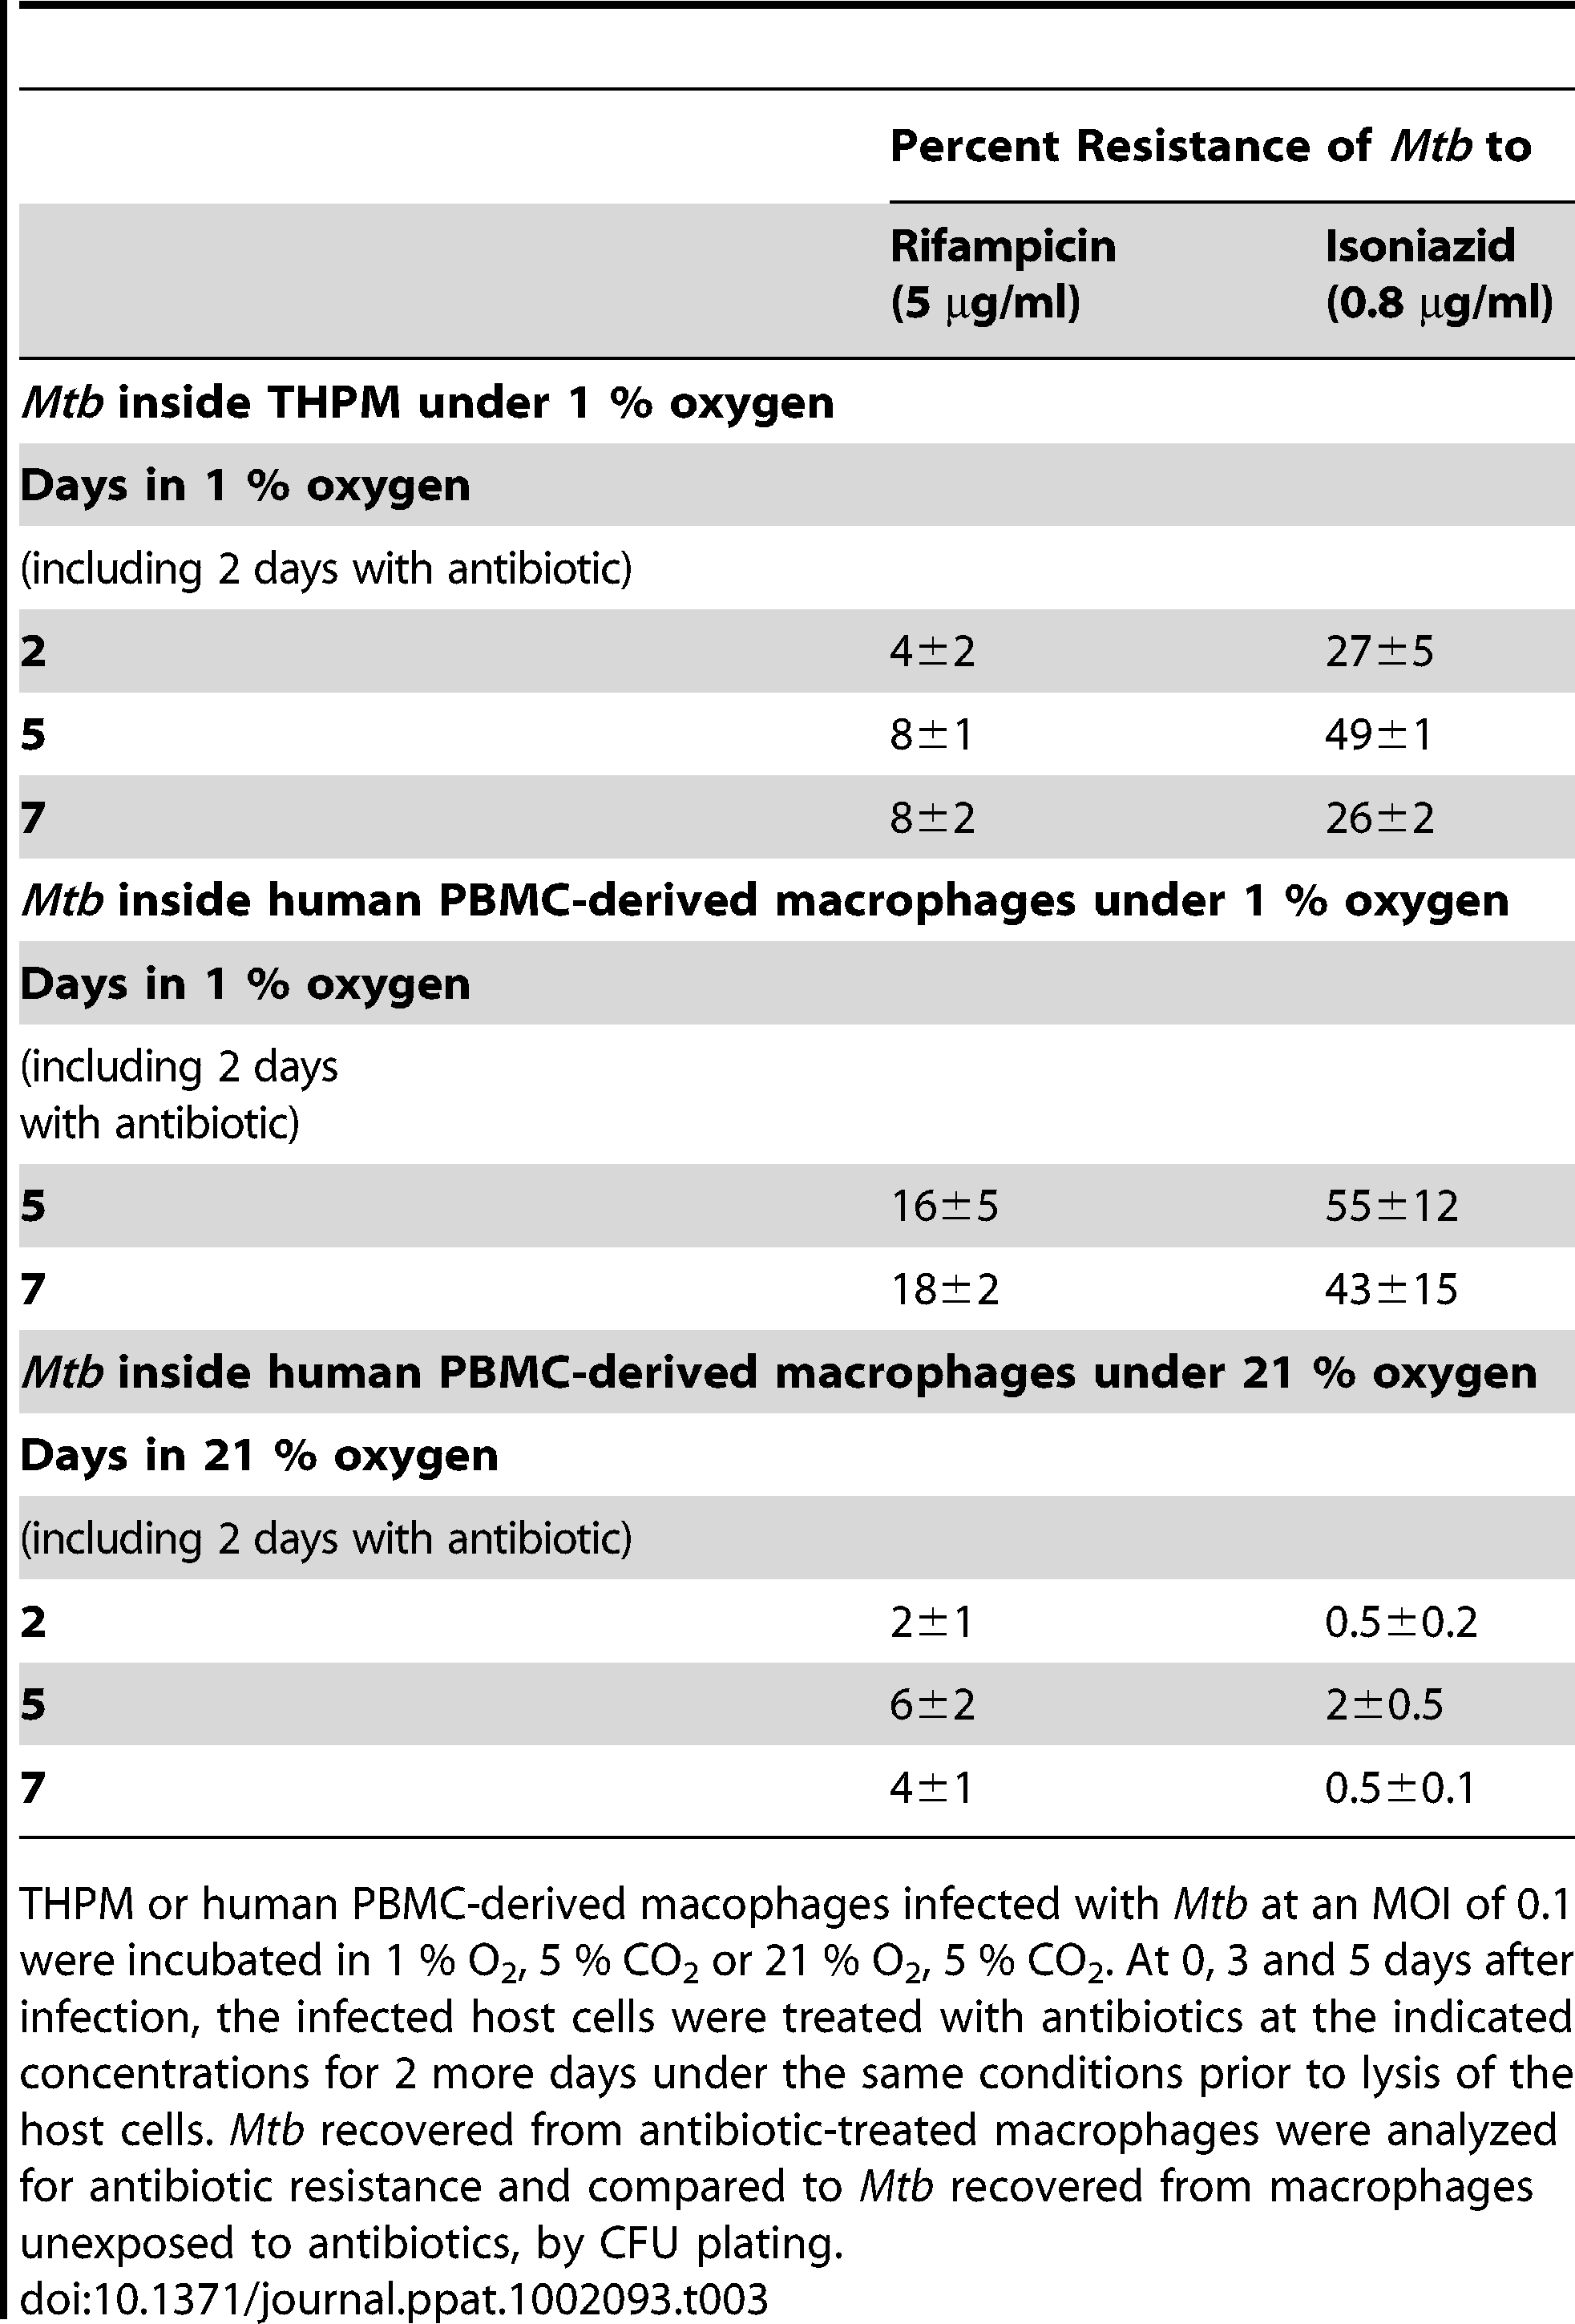 <i>Mtb</i> within hypoxic lipid-loaded macrophages develops phenotypic tolerance to antibiotics.